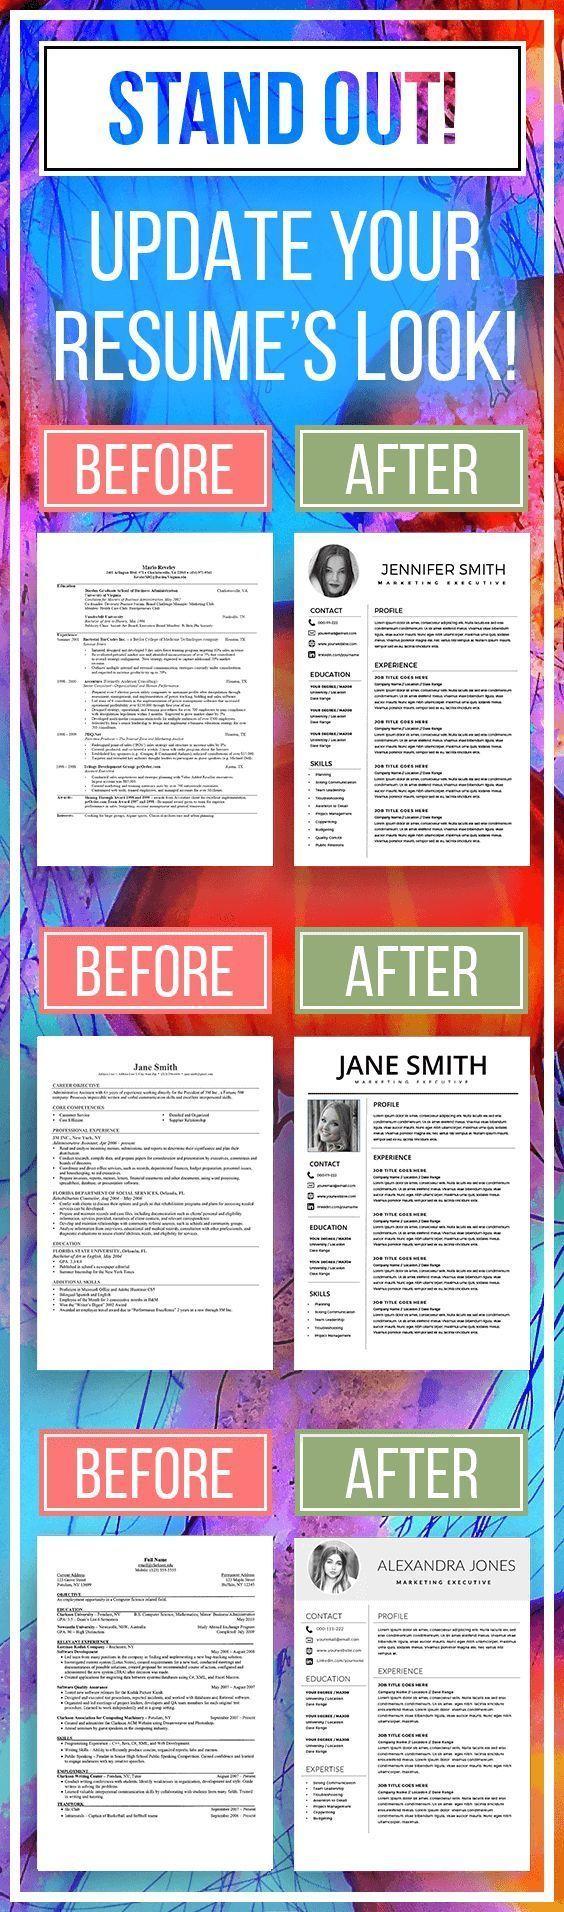 resume template, modern resume, simple resume, clean resume, cool resume, best selling resume, best resume, word resume, resume design, unique resume, professional resume, creative resume